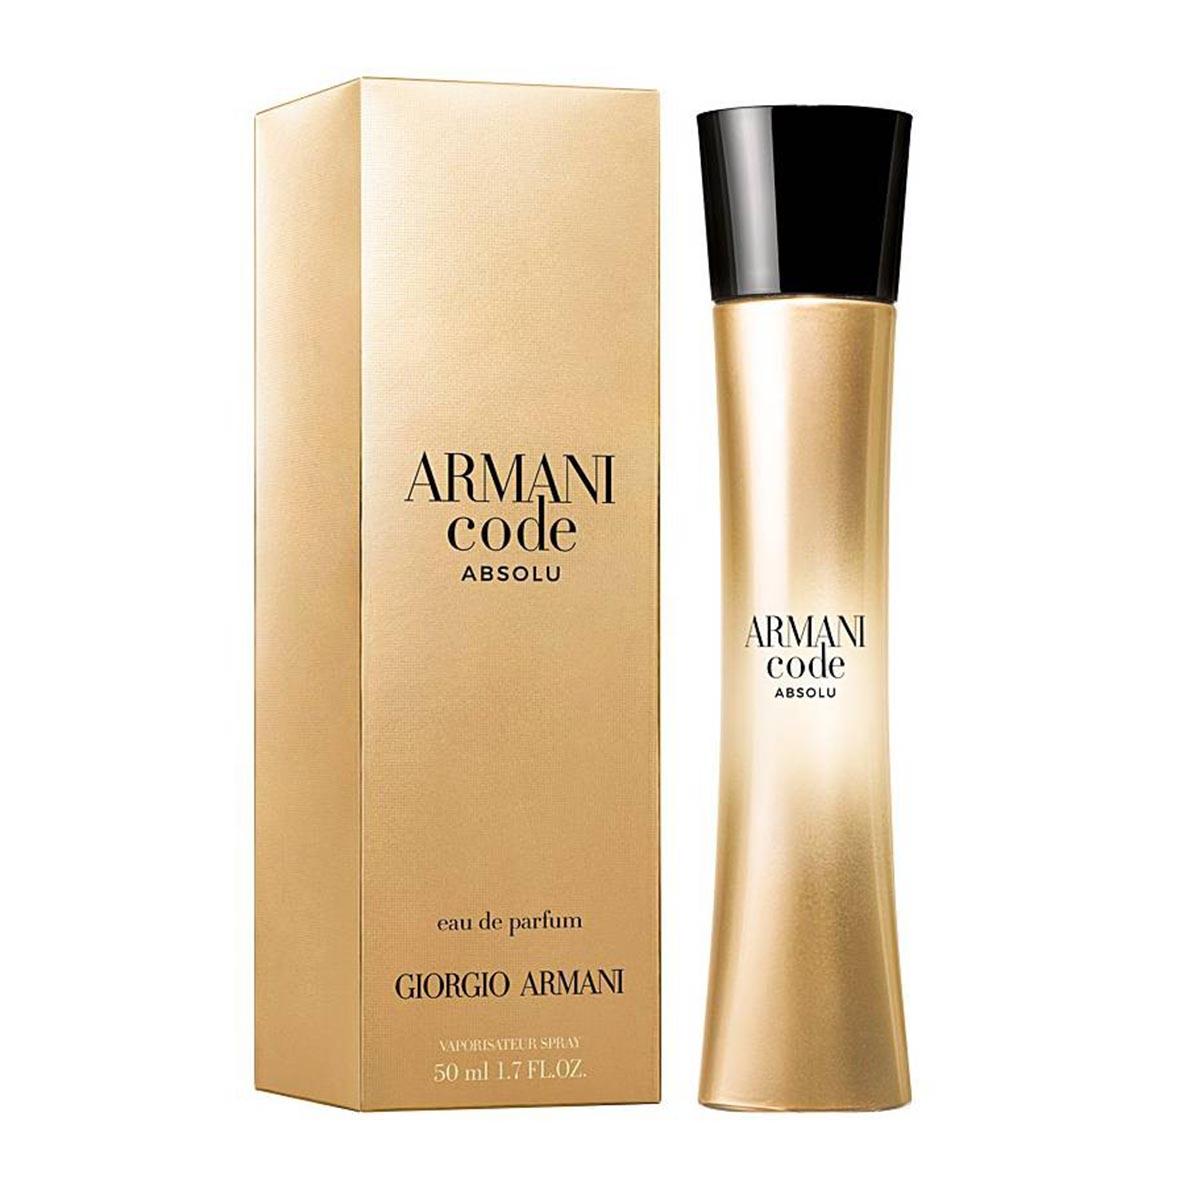 Giorgio armani code absolu eau de parfum 50ml vaporizador